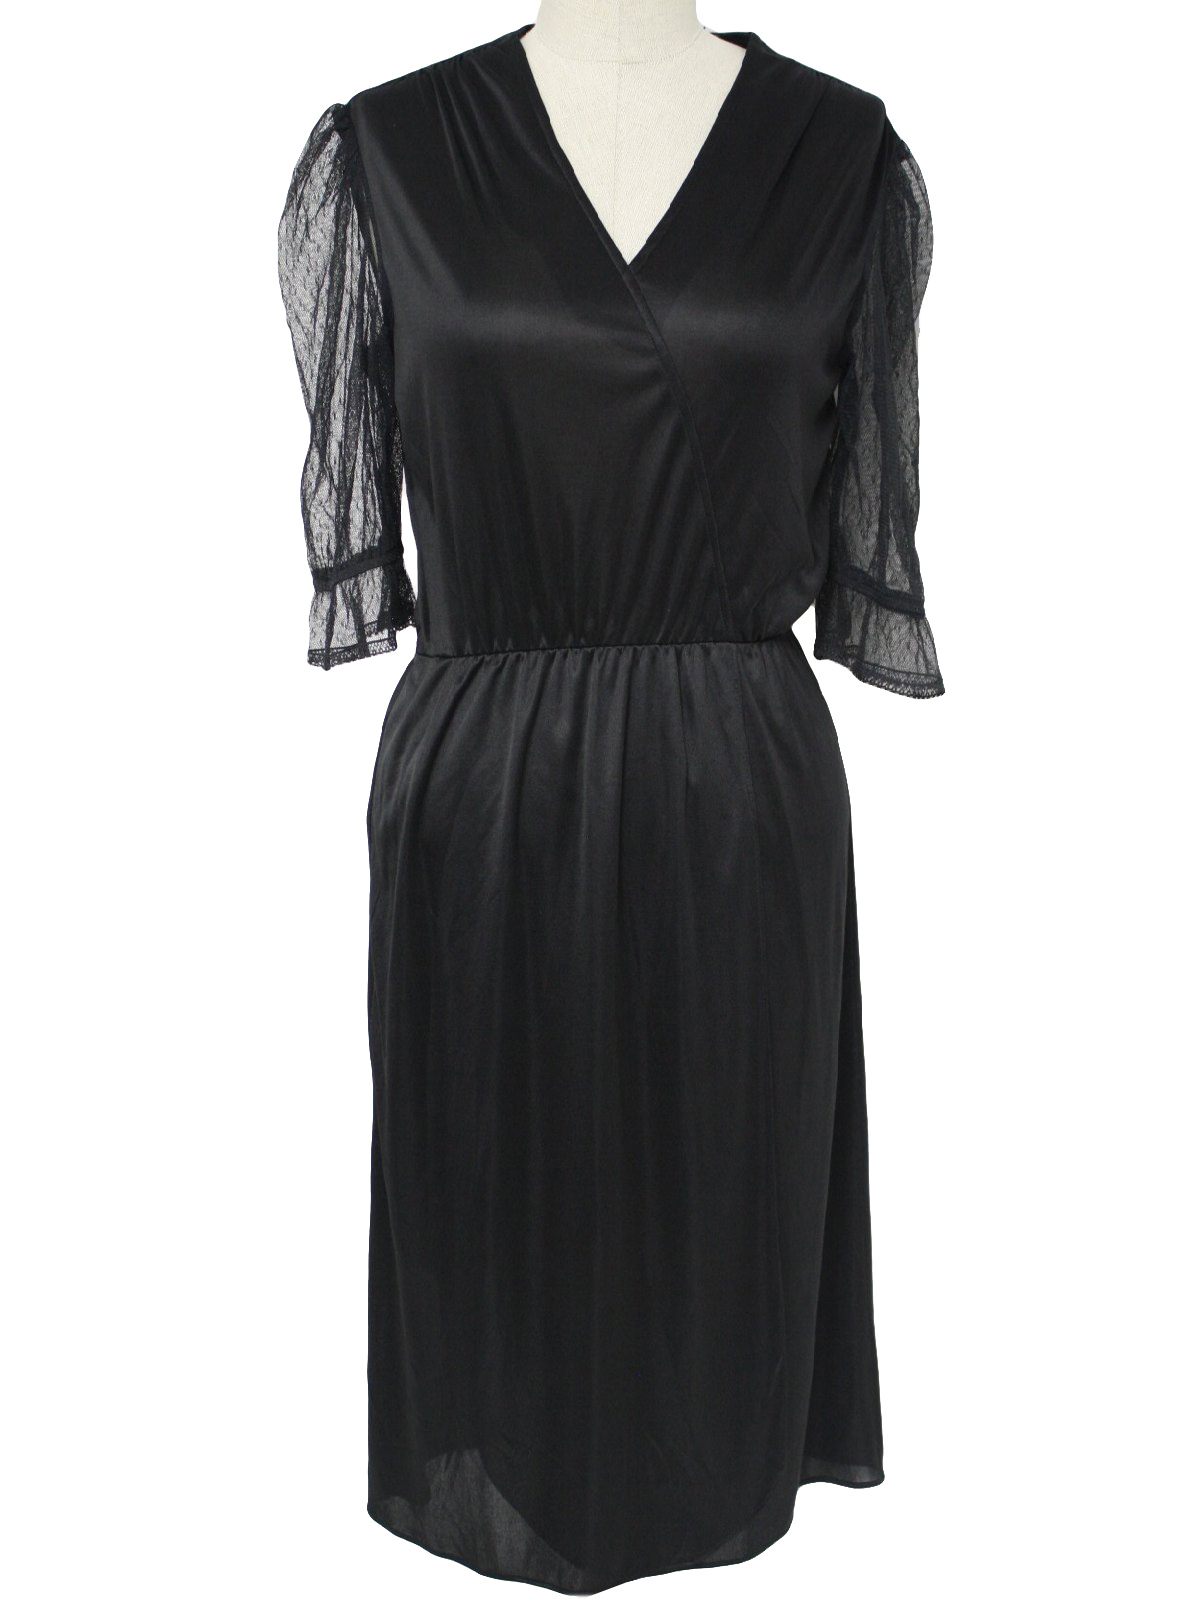 6250056de39 1980's JcPenney Totally 80s Dress